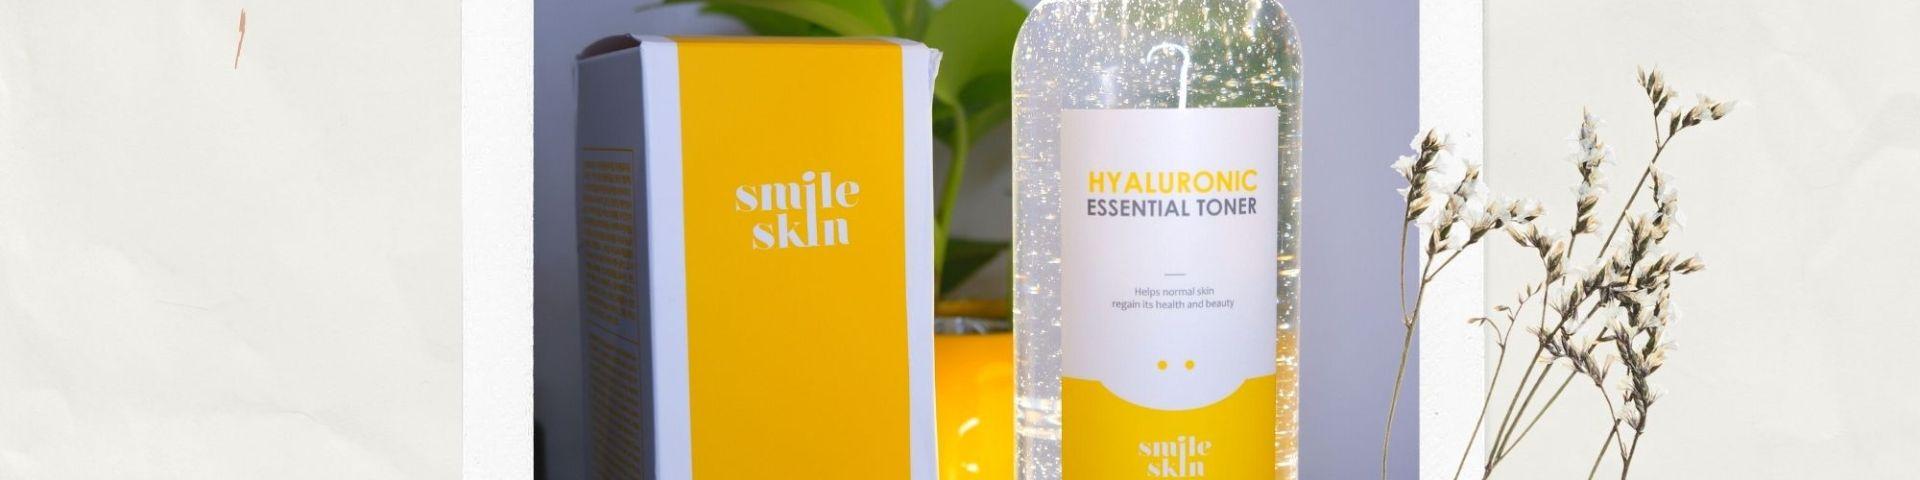 Smile Skin Hyaluronic Toner